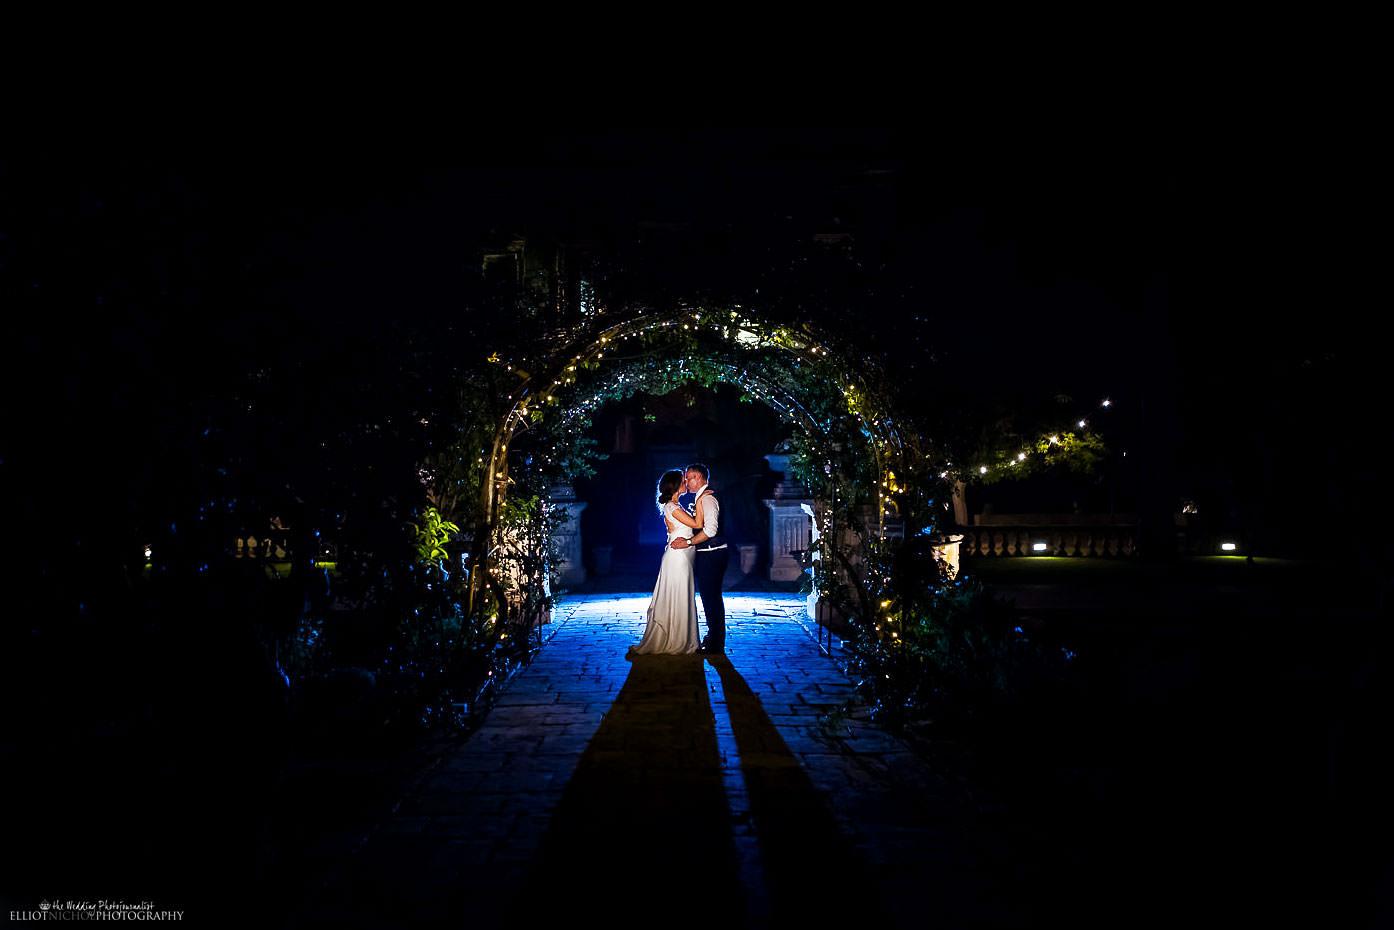 Villa Bologna night wedding photography in Malta.